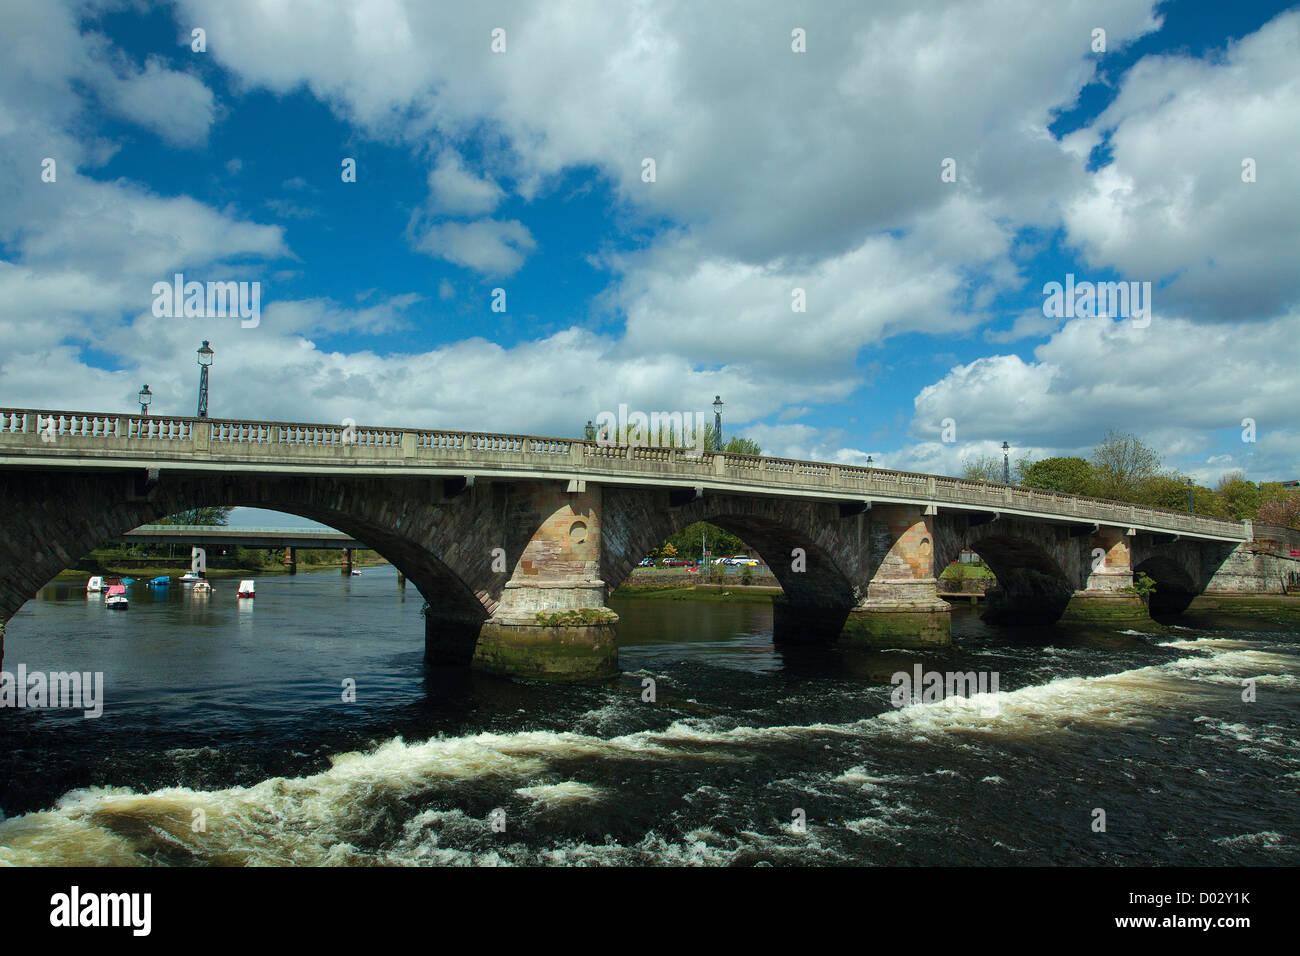 Dumbarton Bridge and the River Leven, Dumbarton - Stock Image